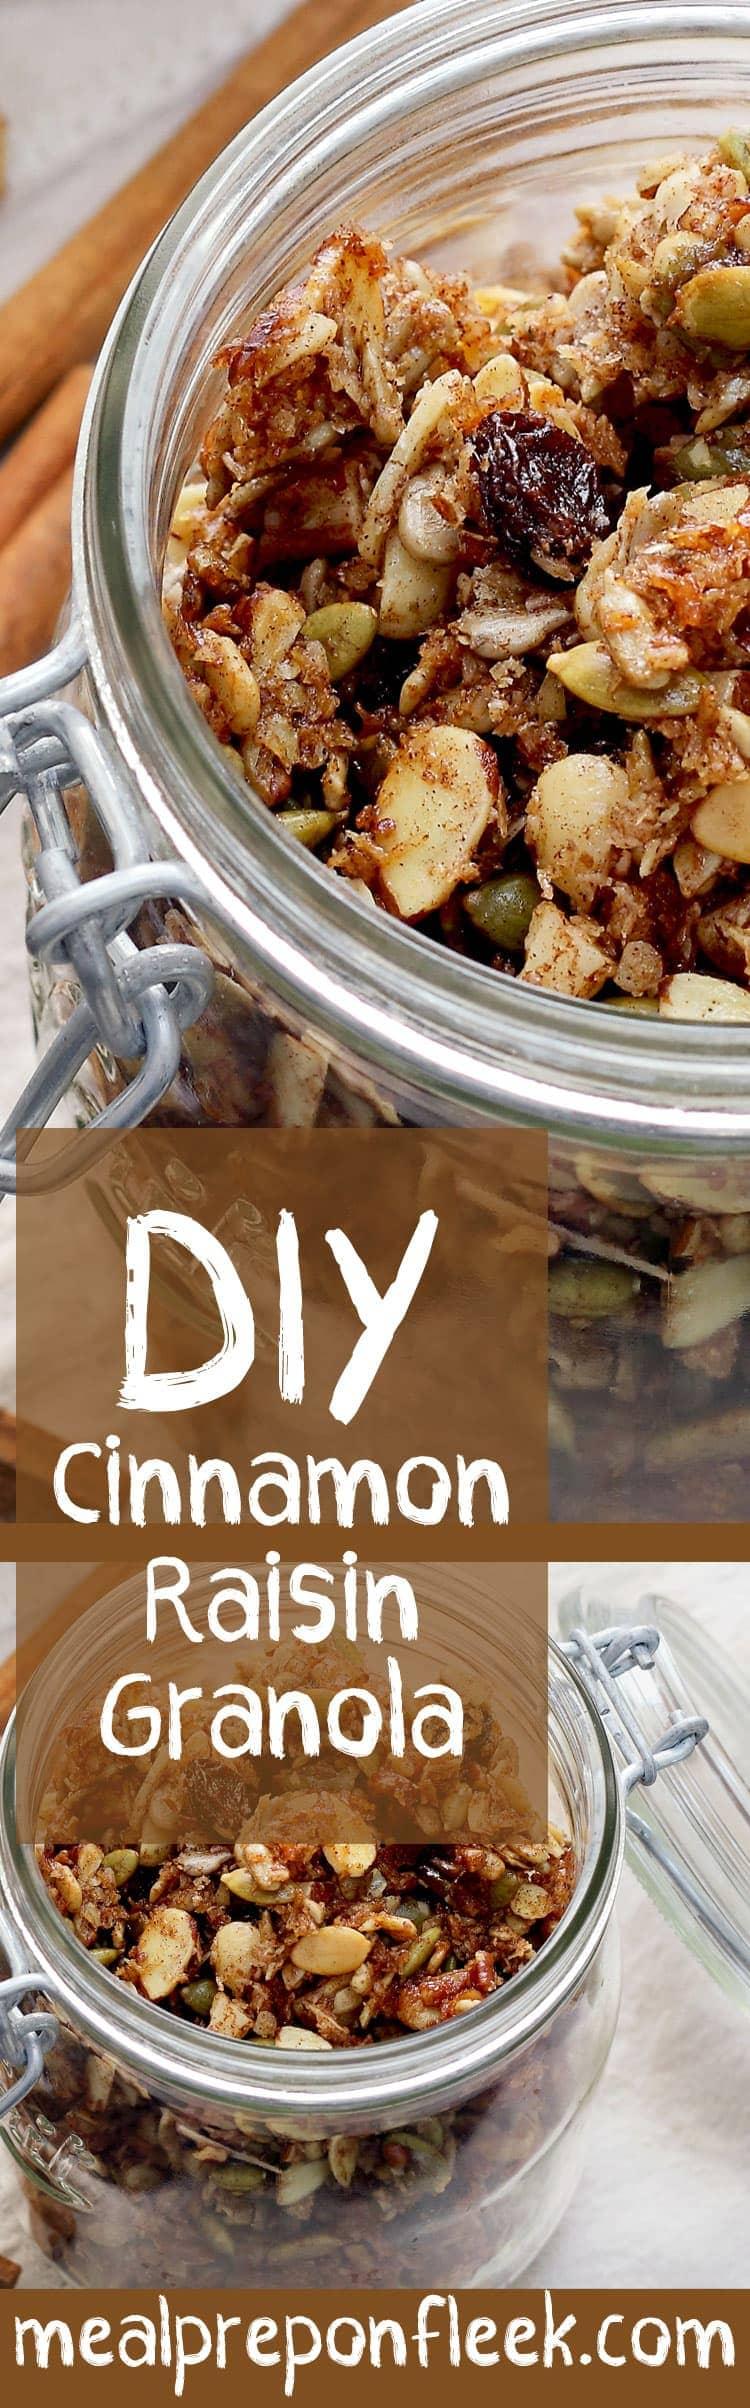 DIY-Cinnamon-Raisin-Granola-pinterest